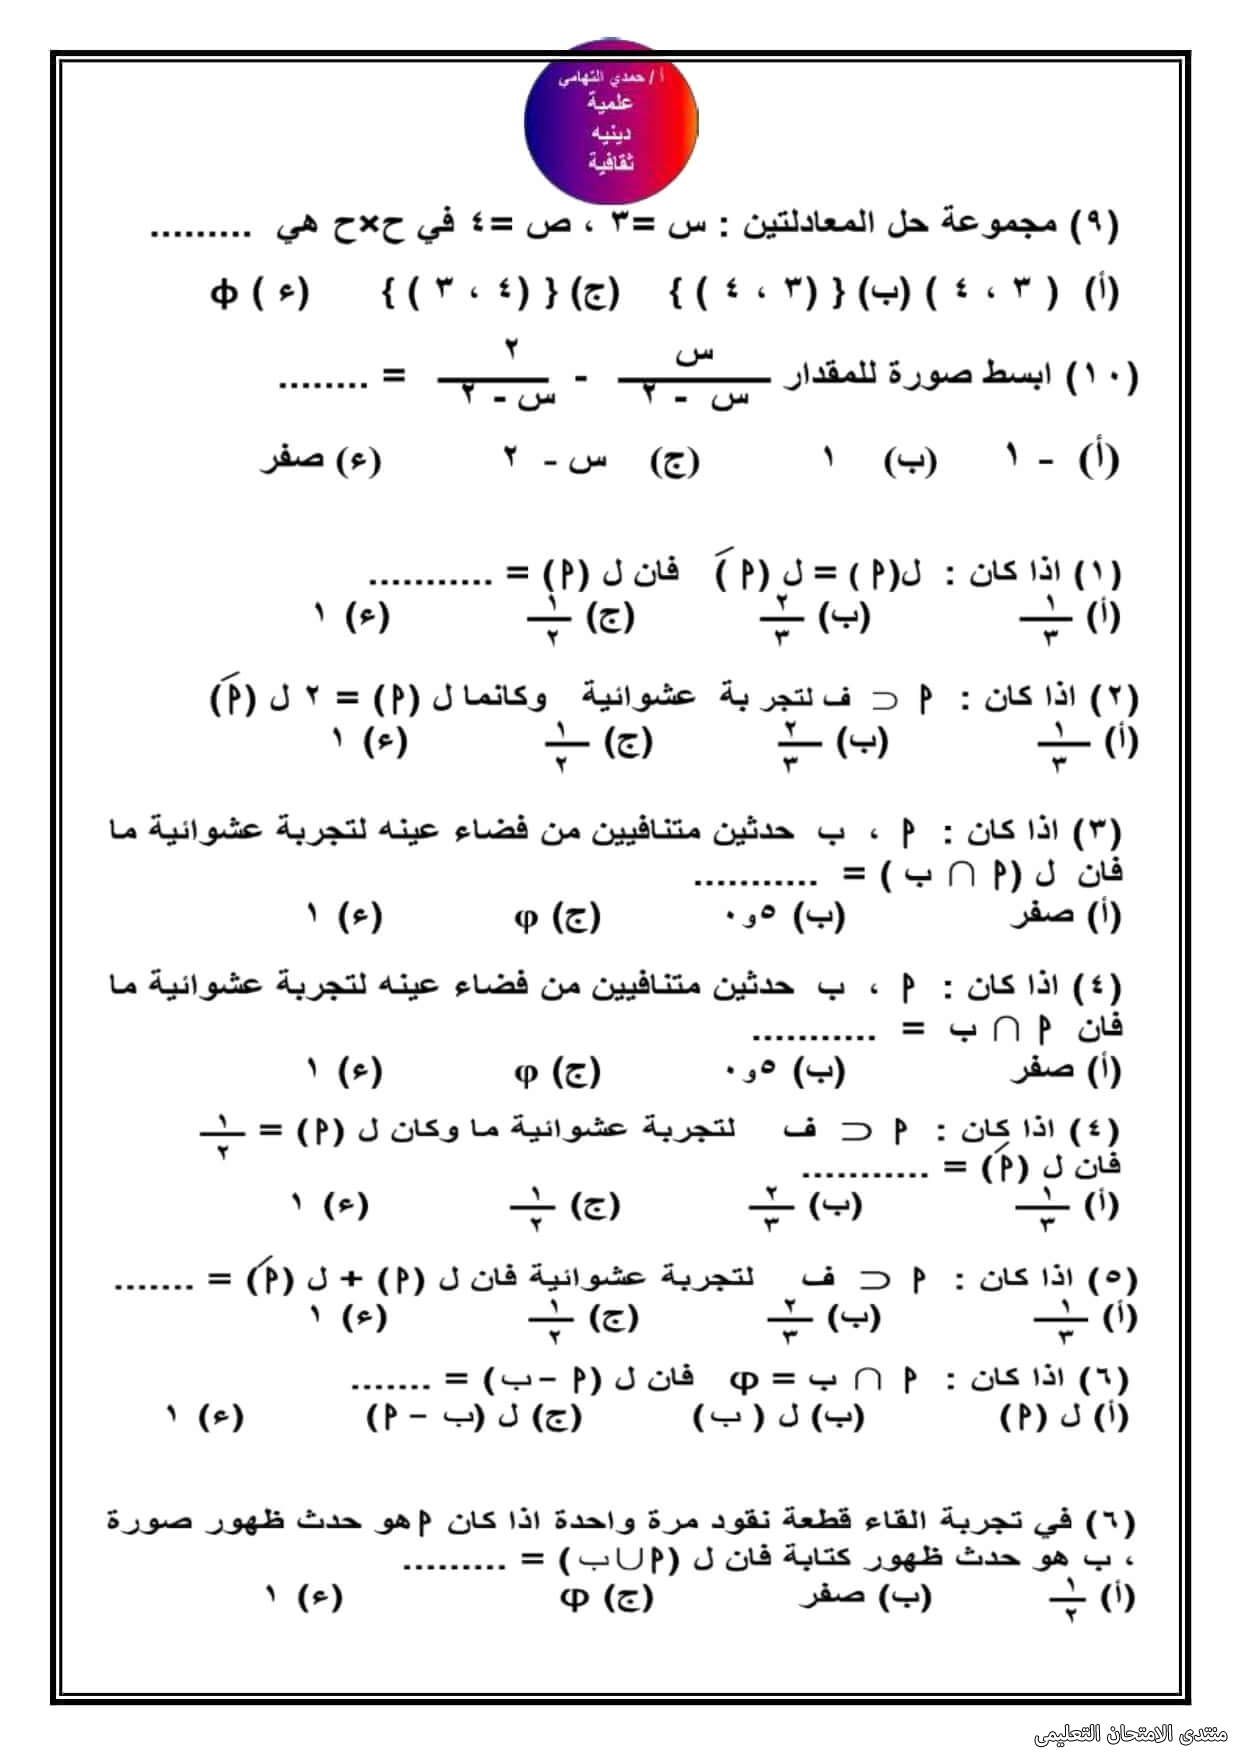 exam-eg.com_16210093174155.jpg